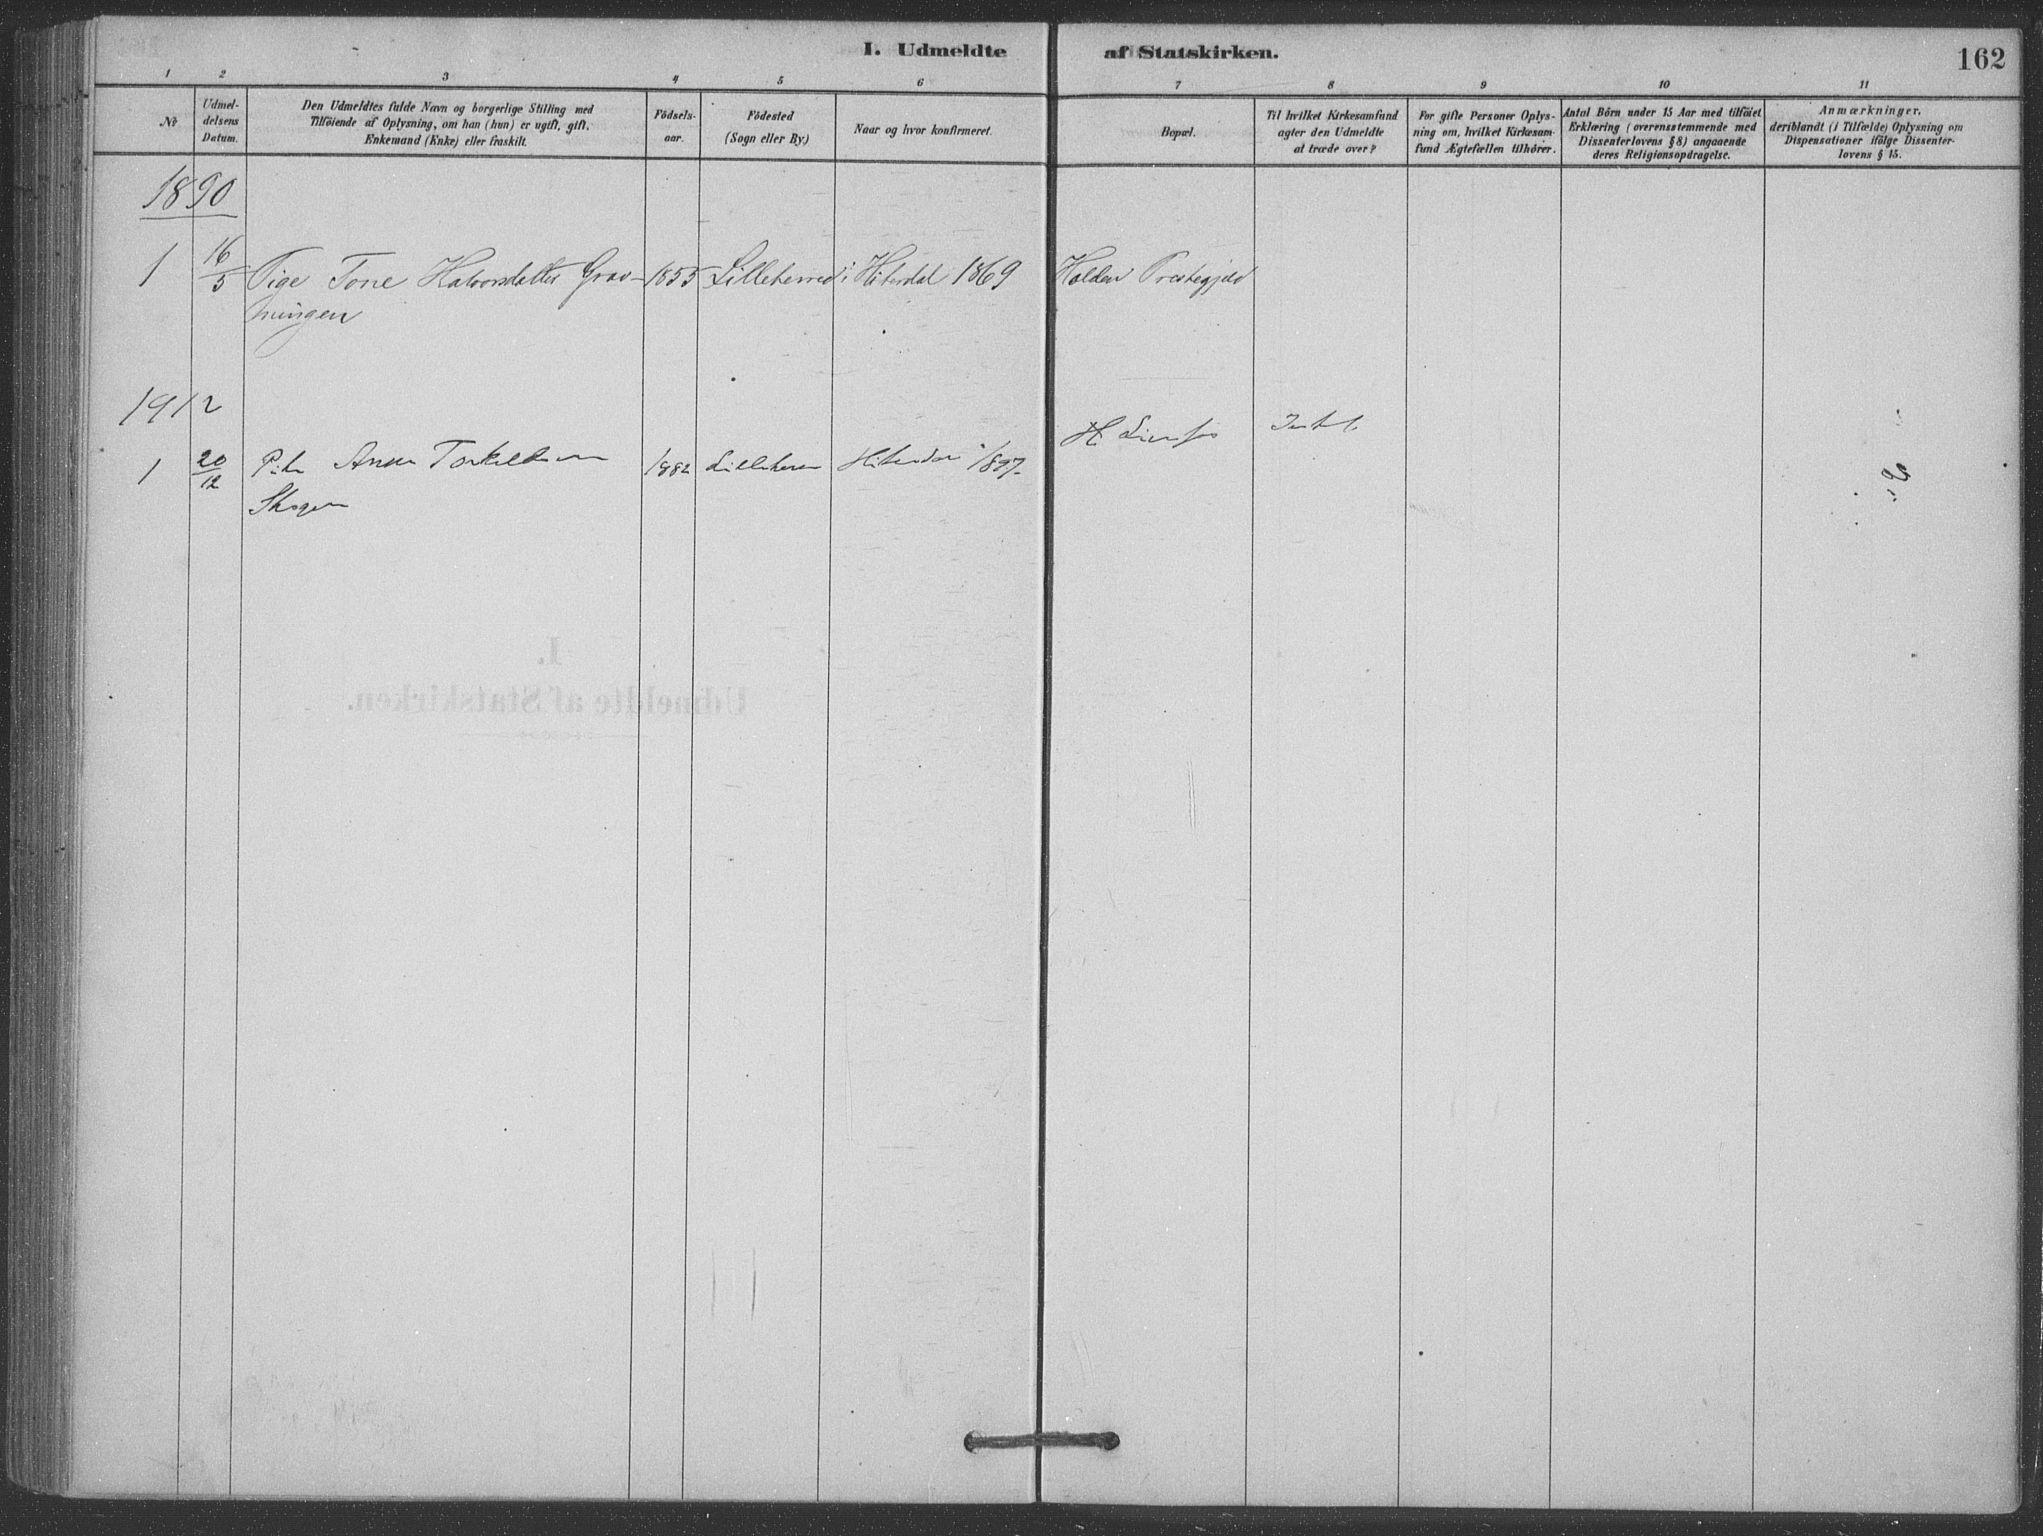 SAKO, Heddal kirkebøker, F/Fb/L0002: Ministerialbok nr. II 2, 1878-1913, s. 162